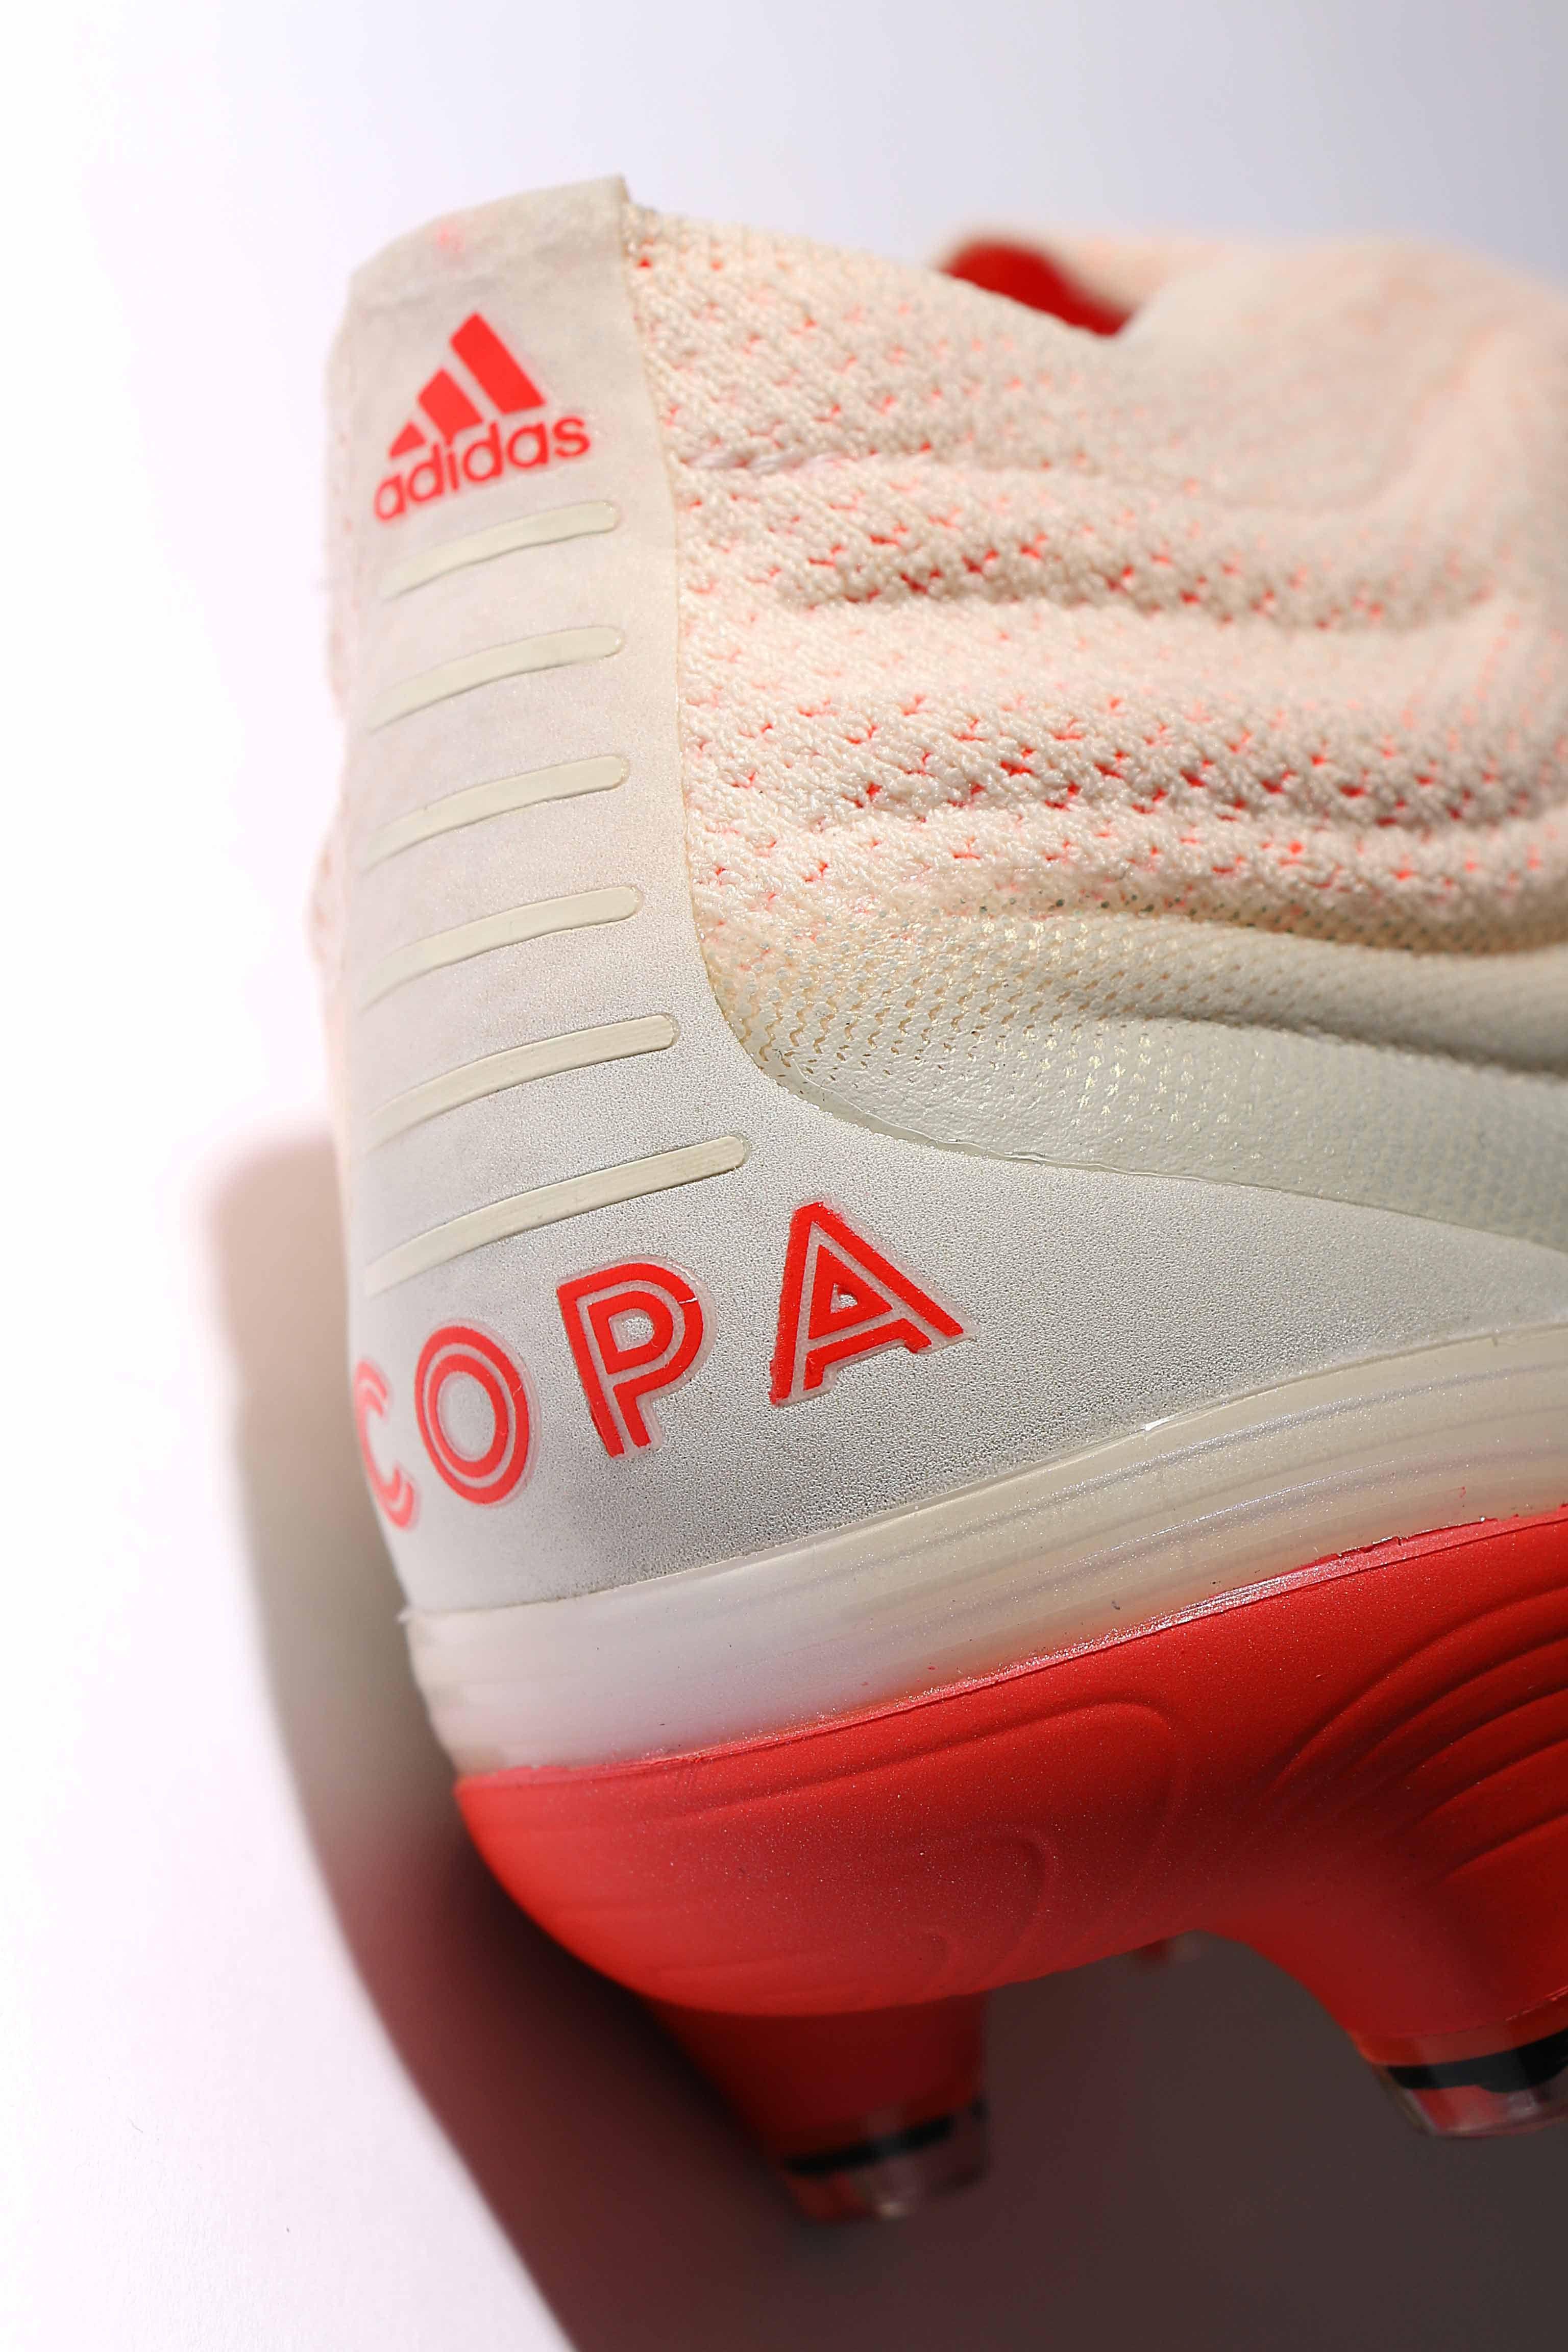 f781a2ab134  adidas  Dybala  cleats  initiatorpack  adidascopa  adidasFootball   HereToCreate  Dybala  Football  Soccer